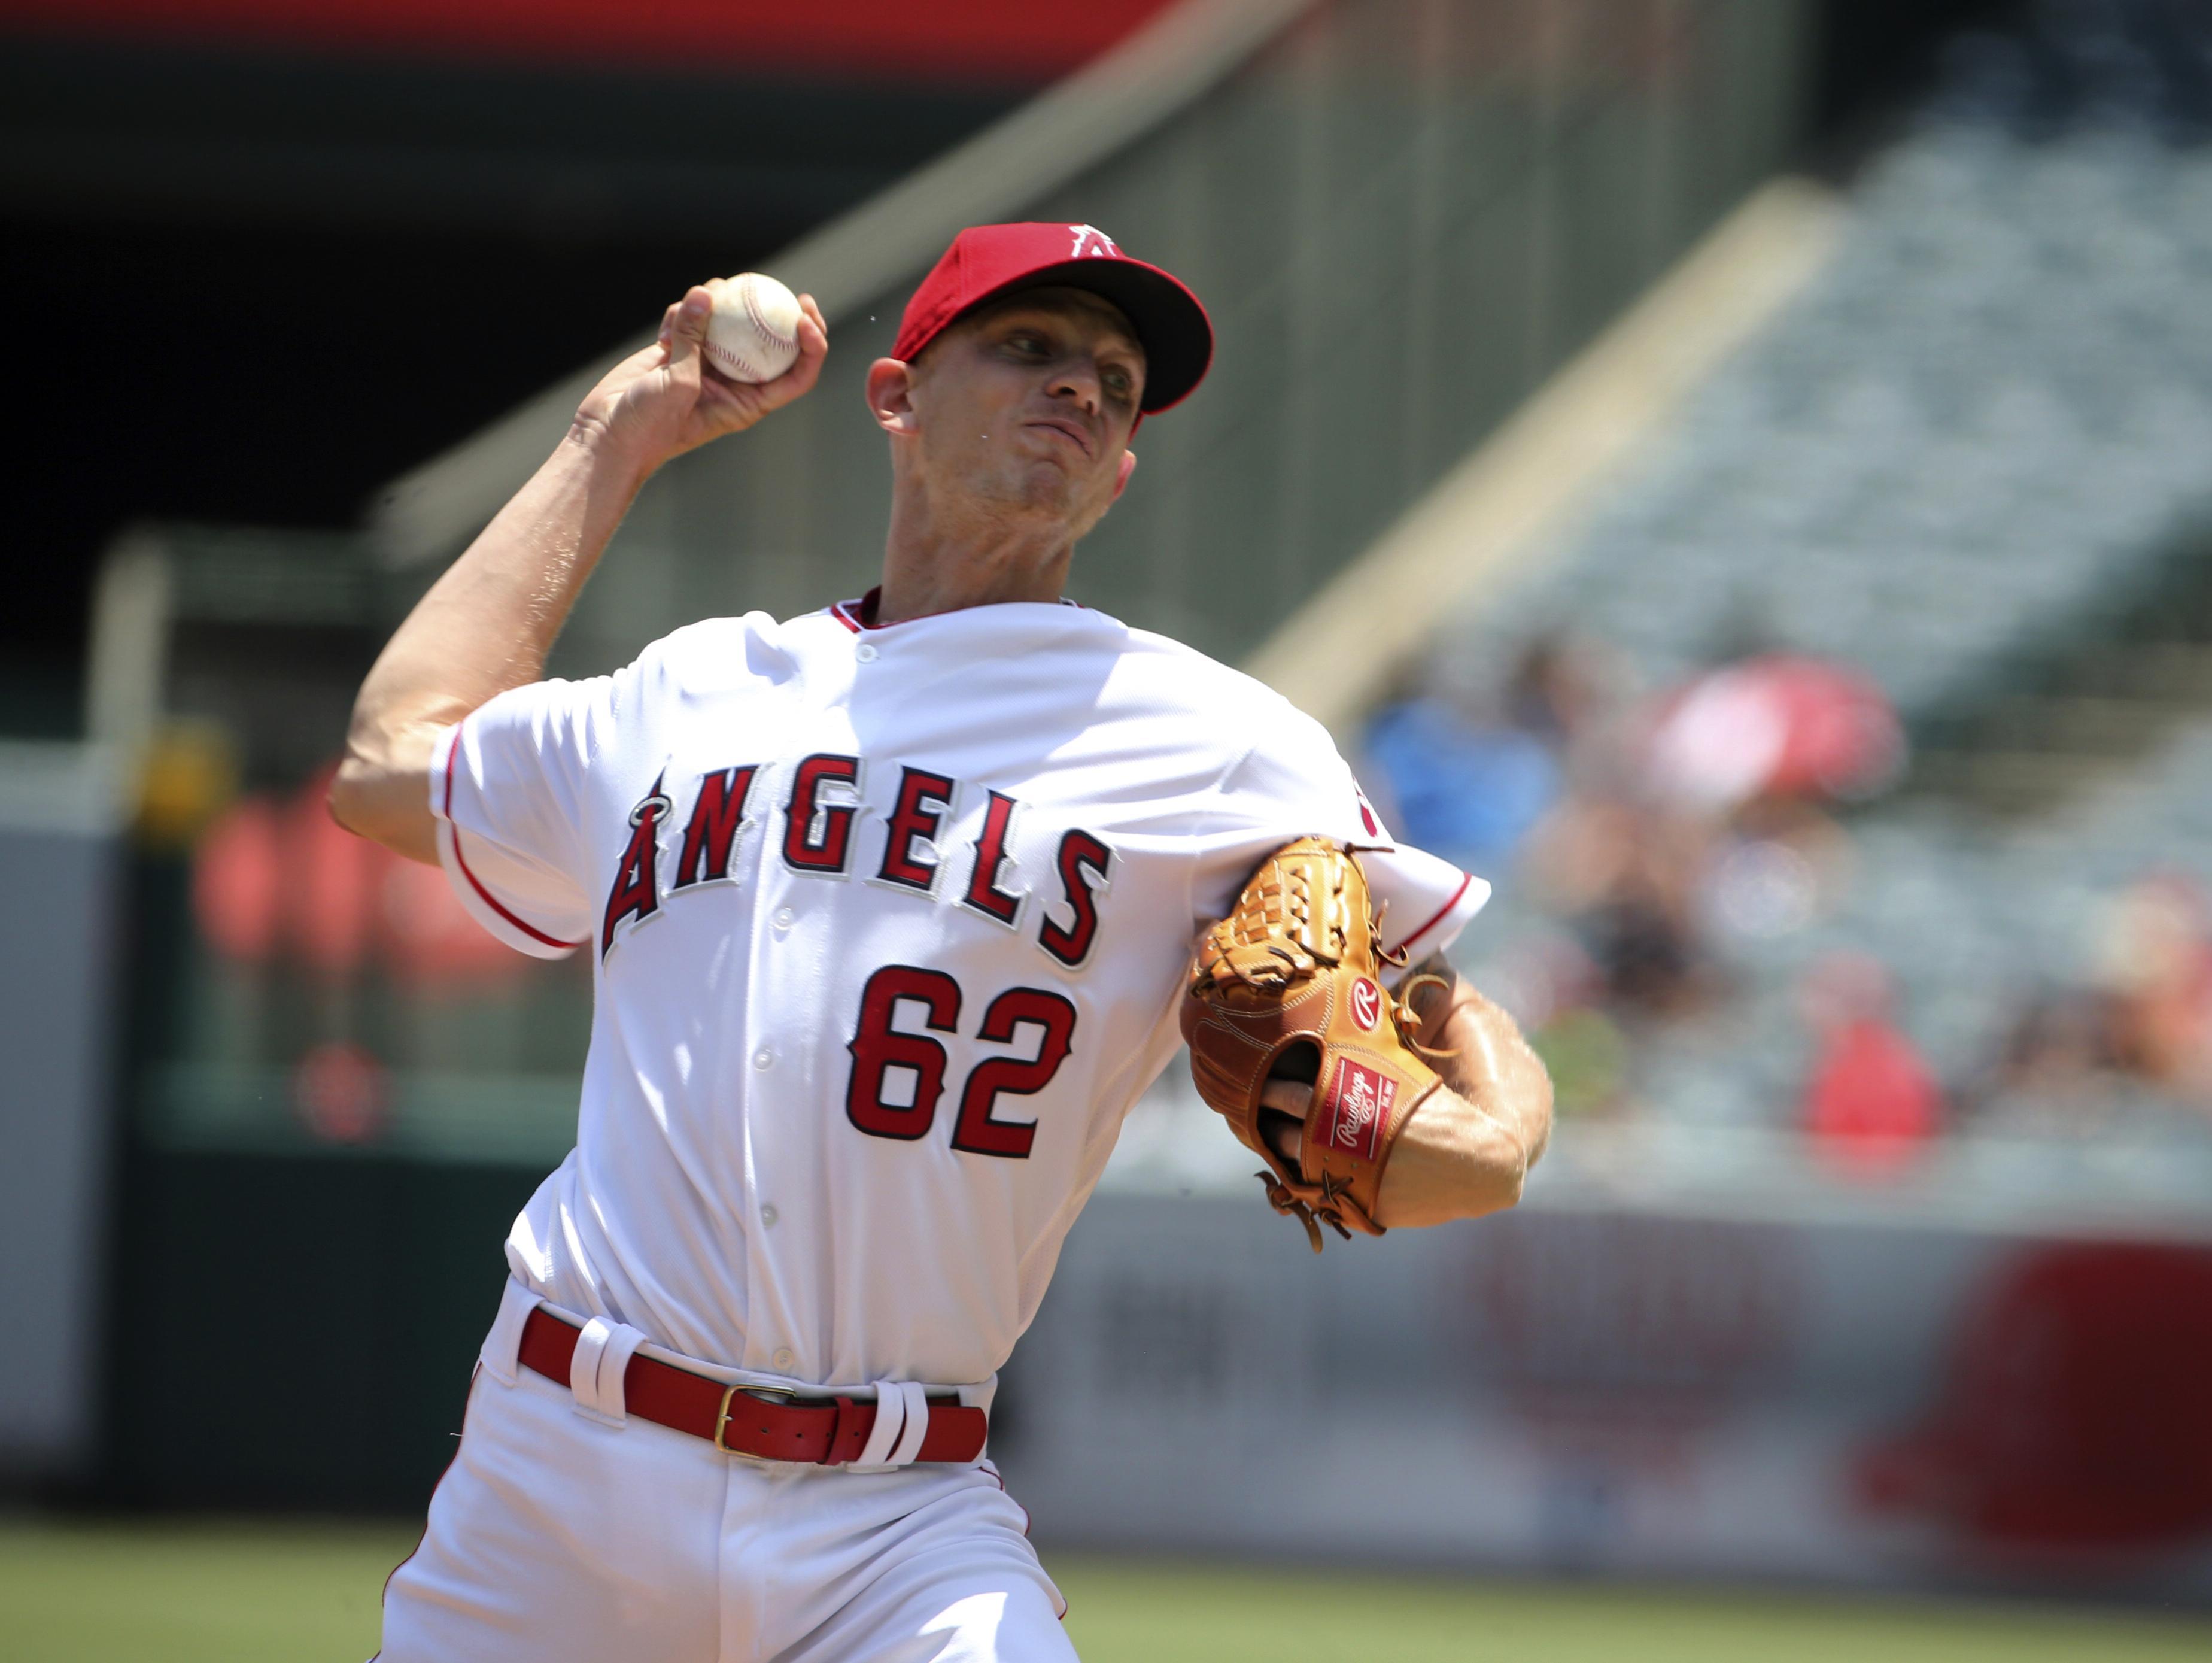 Red_sox_angels_baseball_93980